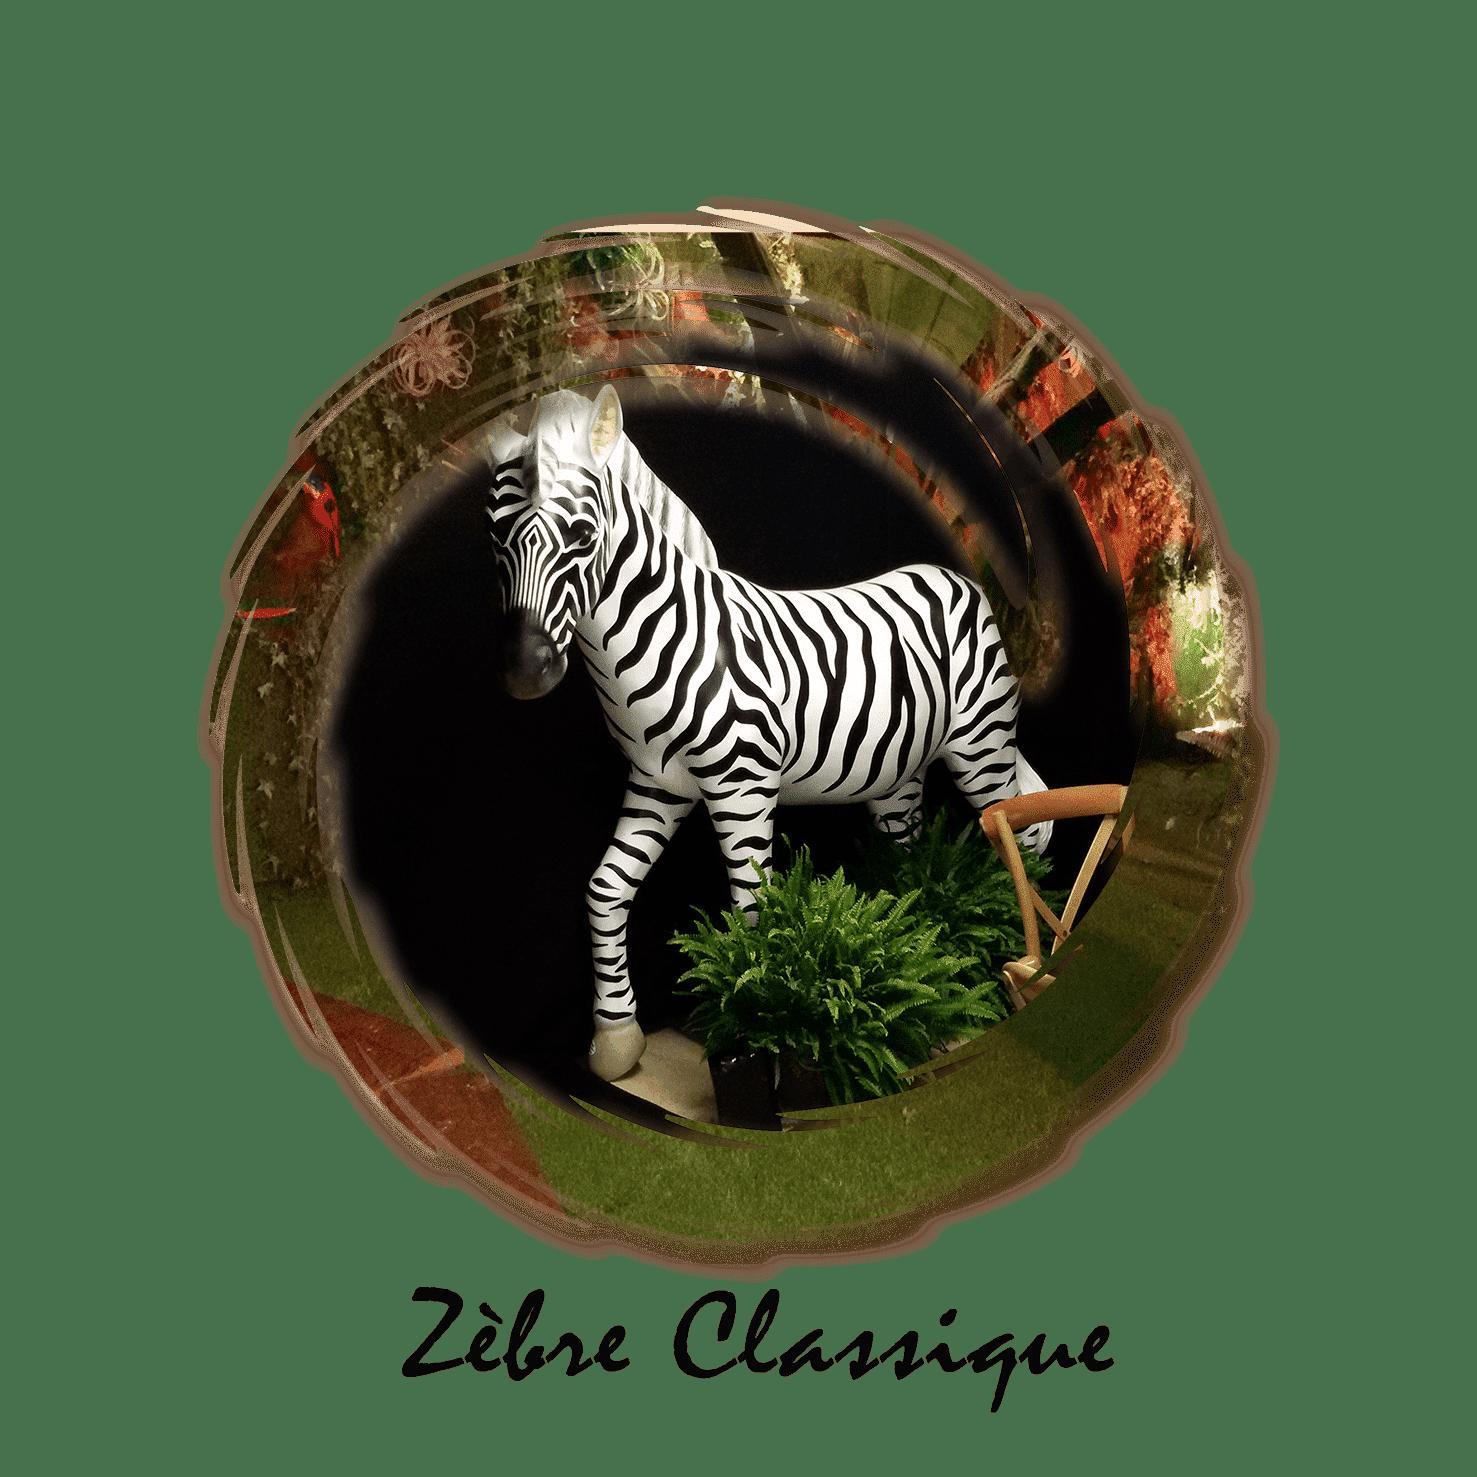 zebre classique